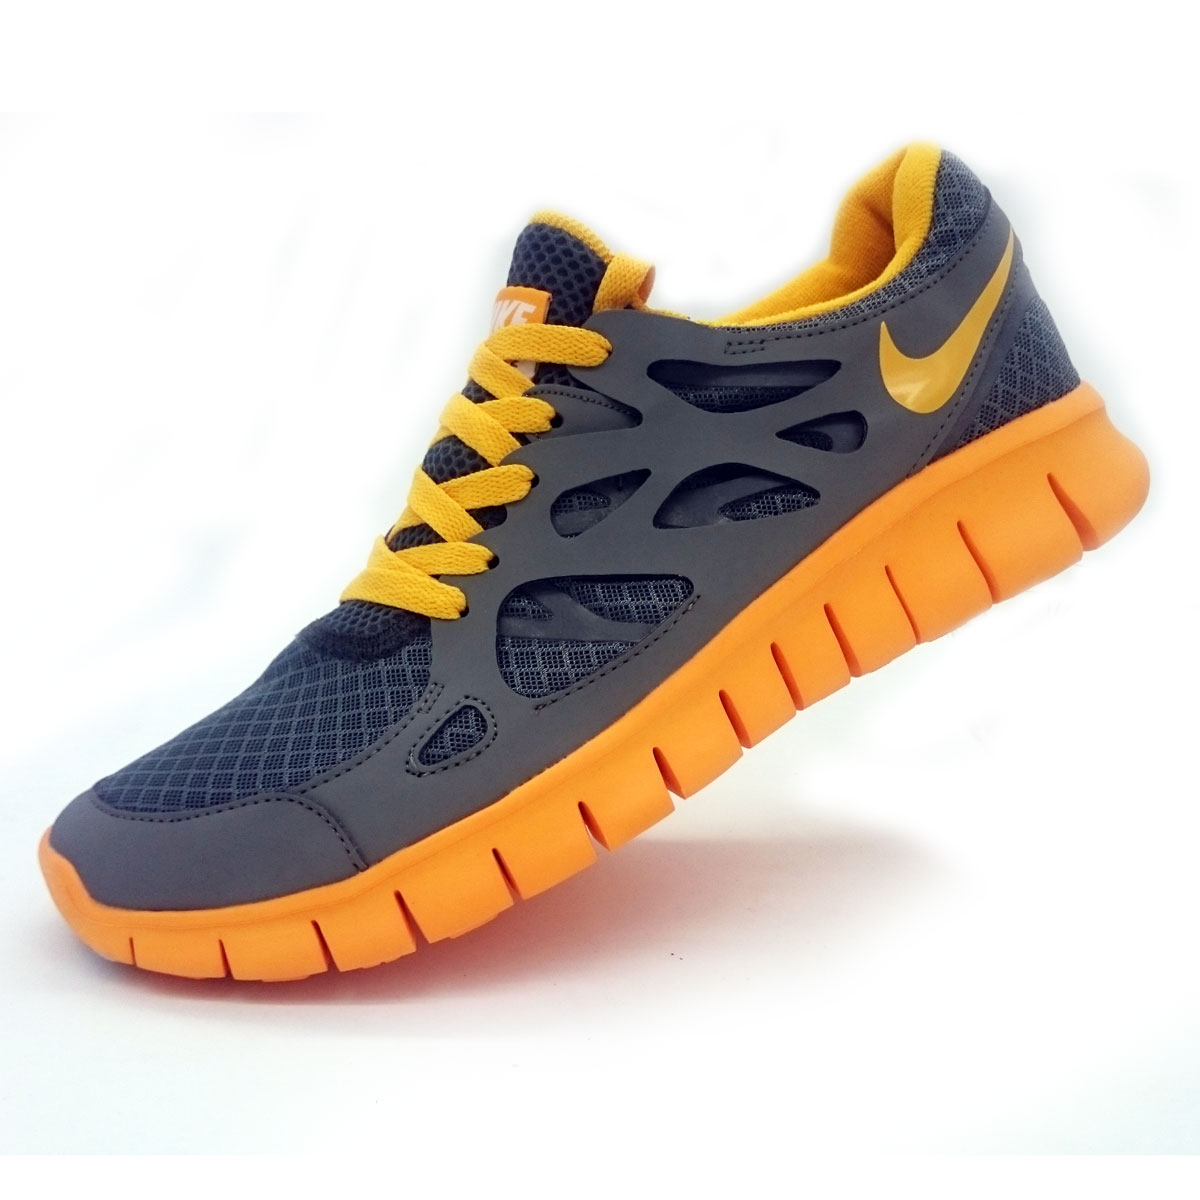 фото main Кроссовки для бега Nike Free Run 2 Найк Фри Ран, серо-желтые main